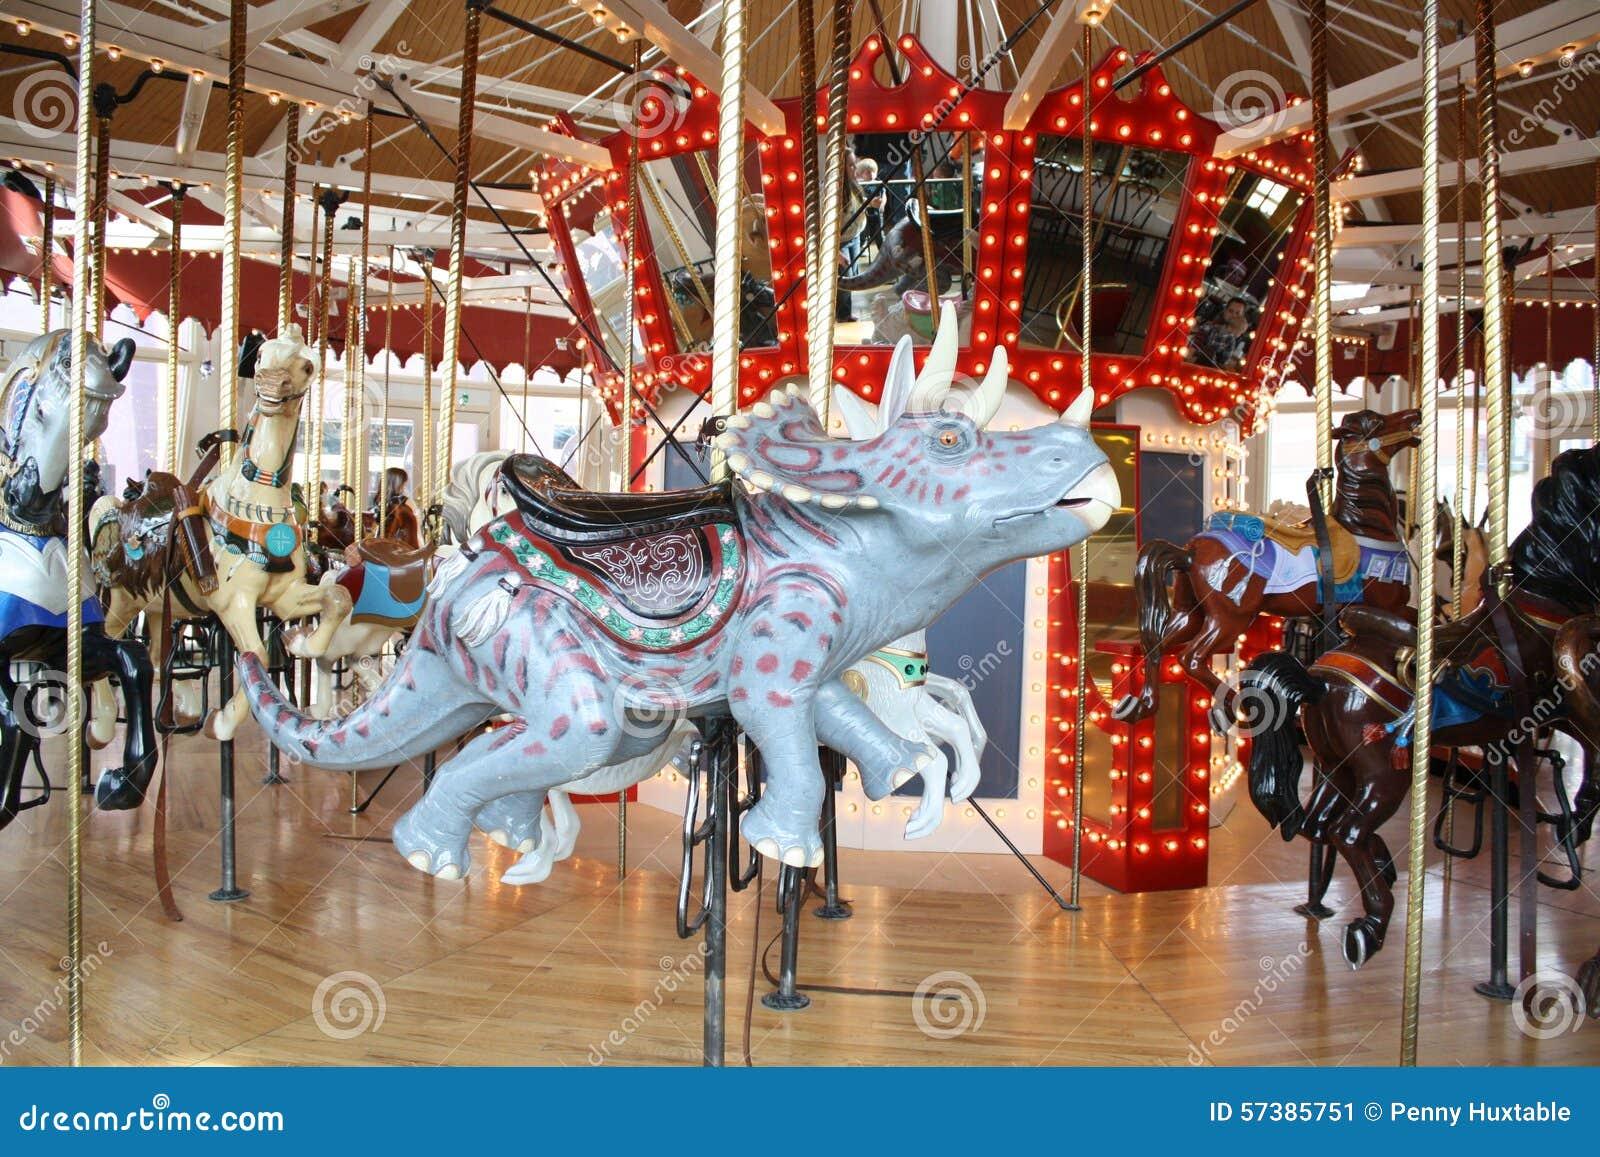 carousel dinosaur triceratops stock image image of carousel vibrant 57385751. Black Bedroom Furniture Sets. Home Design Ideas